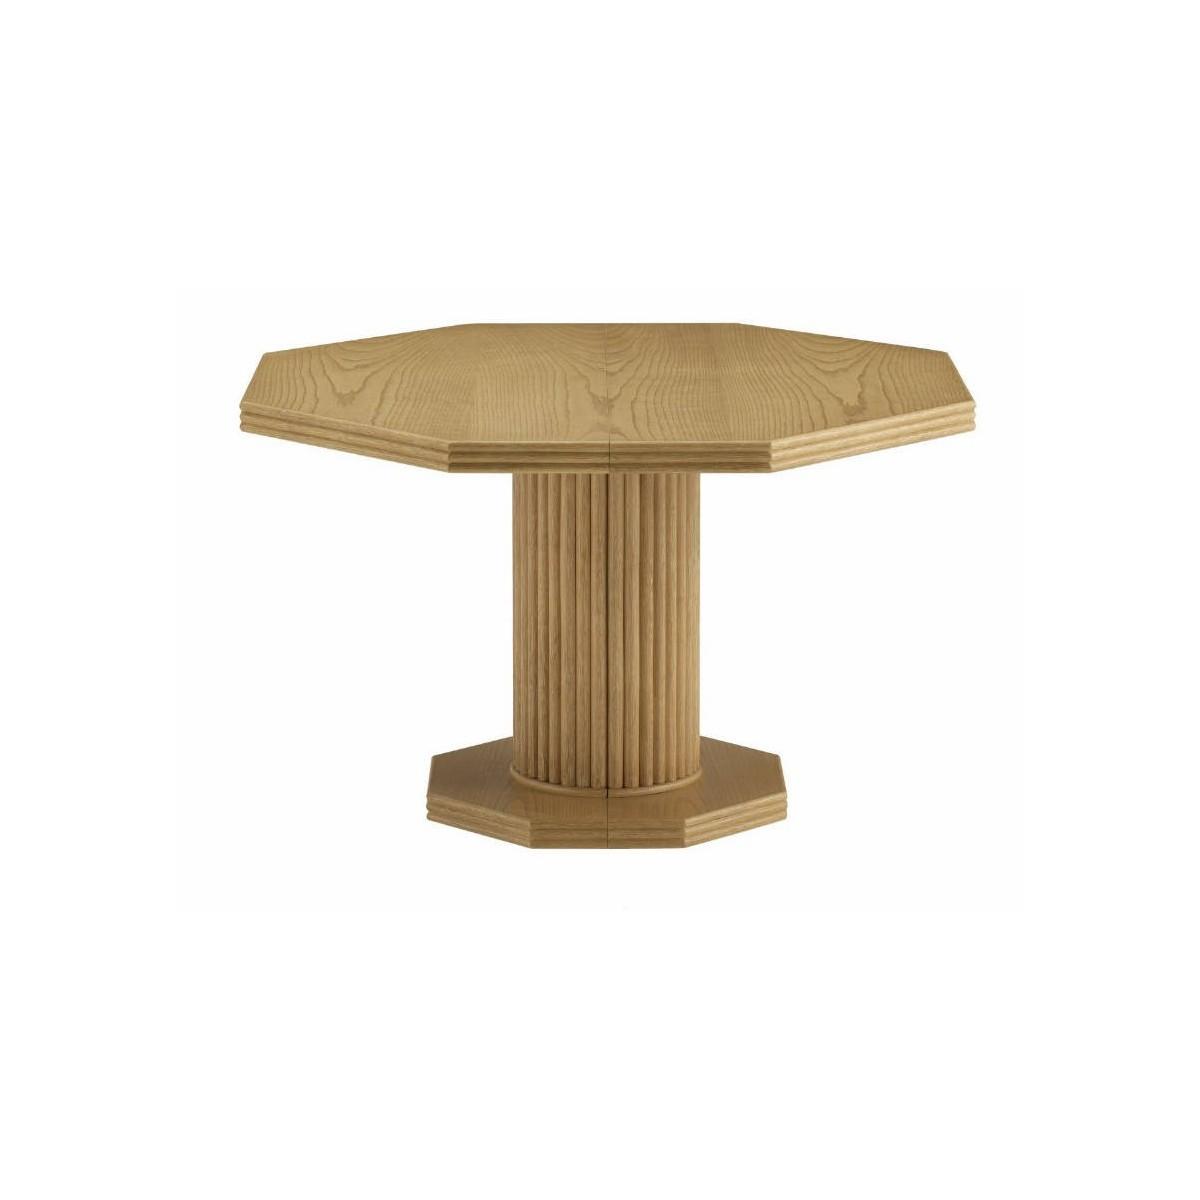 table de salon en rotin octogonale pied central. Black Bedroom Furniture Sets. Home Design Ideas